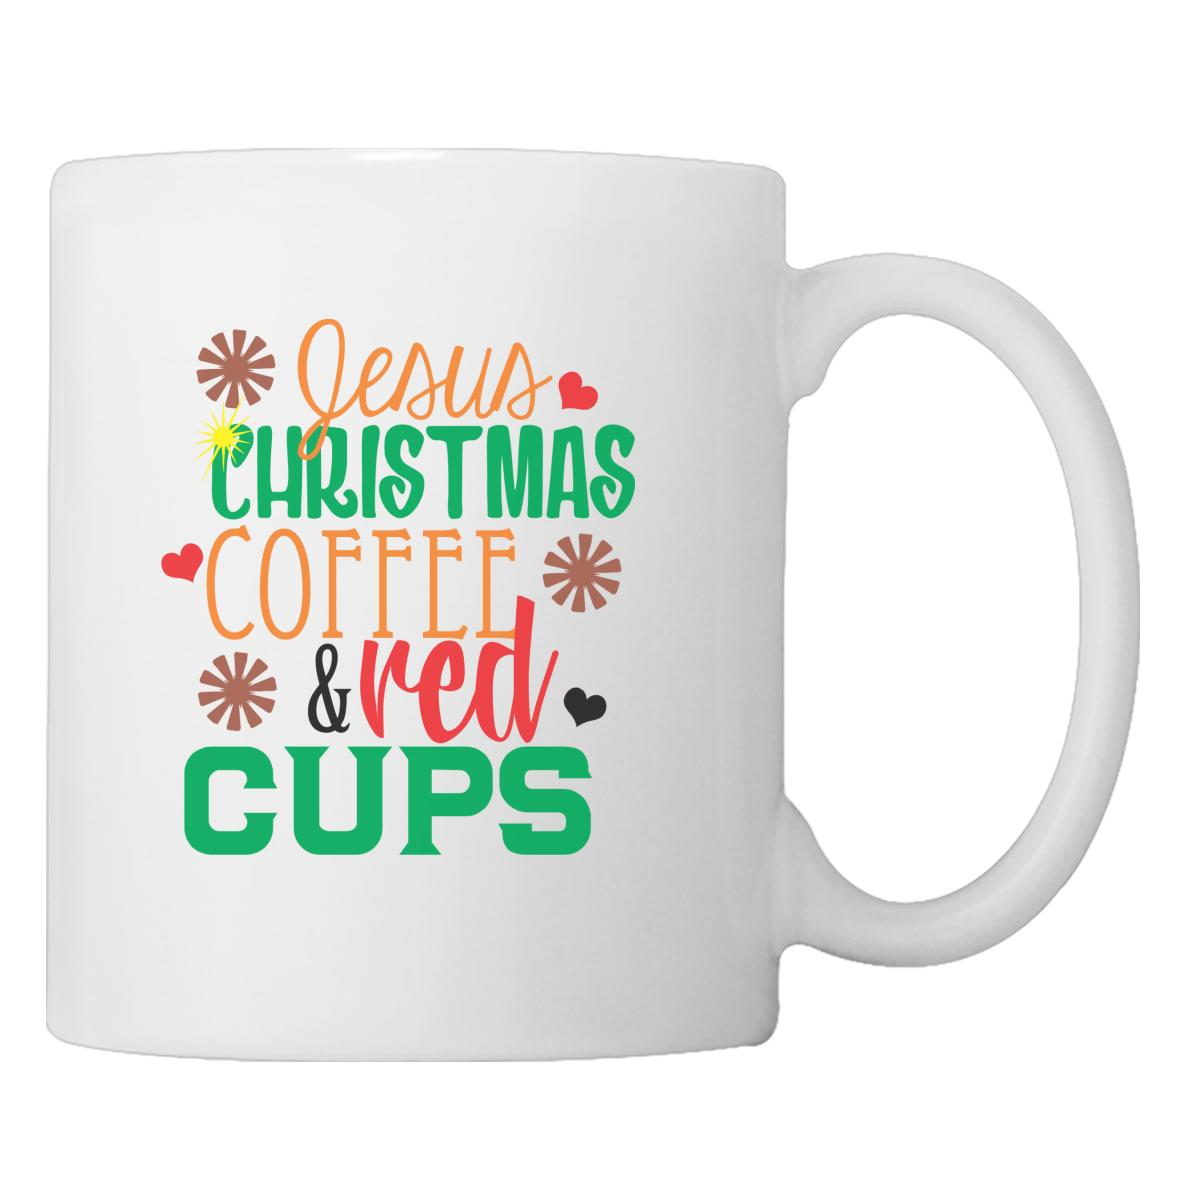 jesus christmas coffee and red cups coffee mug customoncom - Christmas Coffee Cups